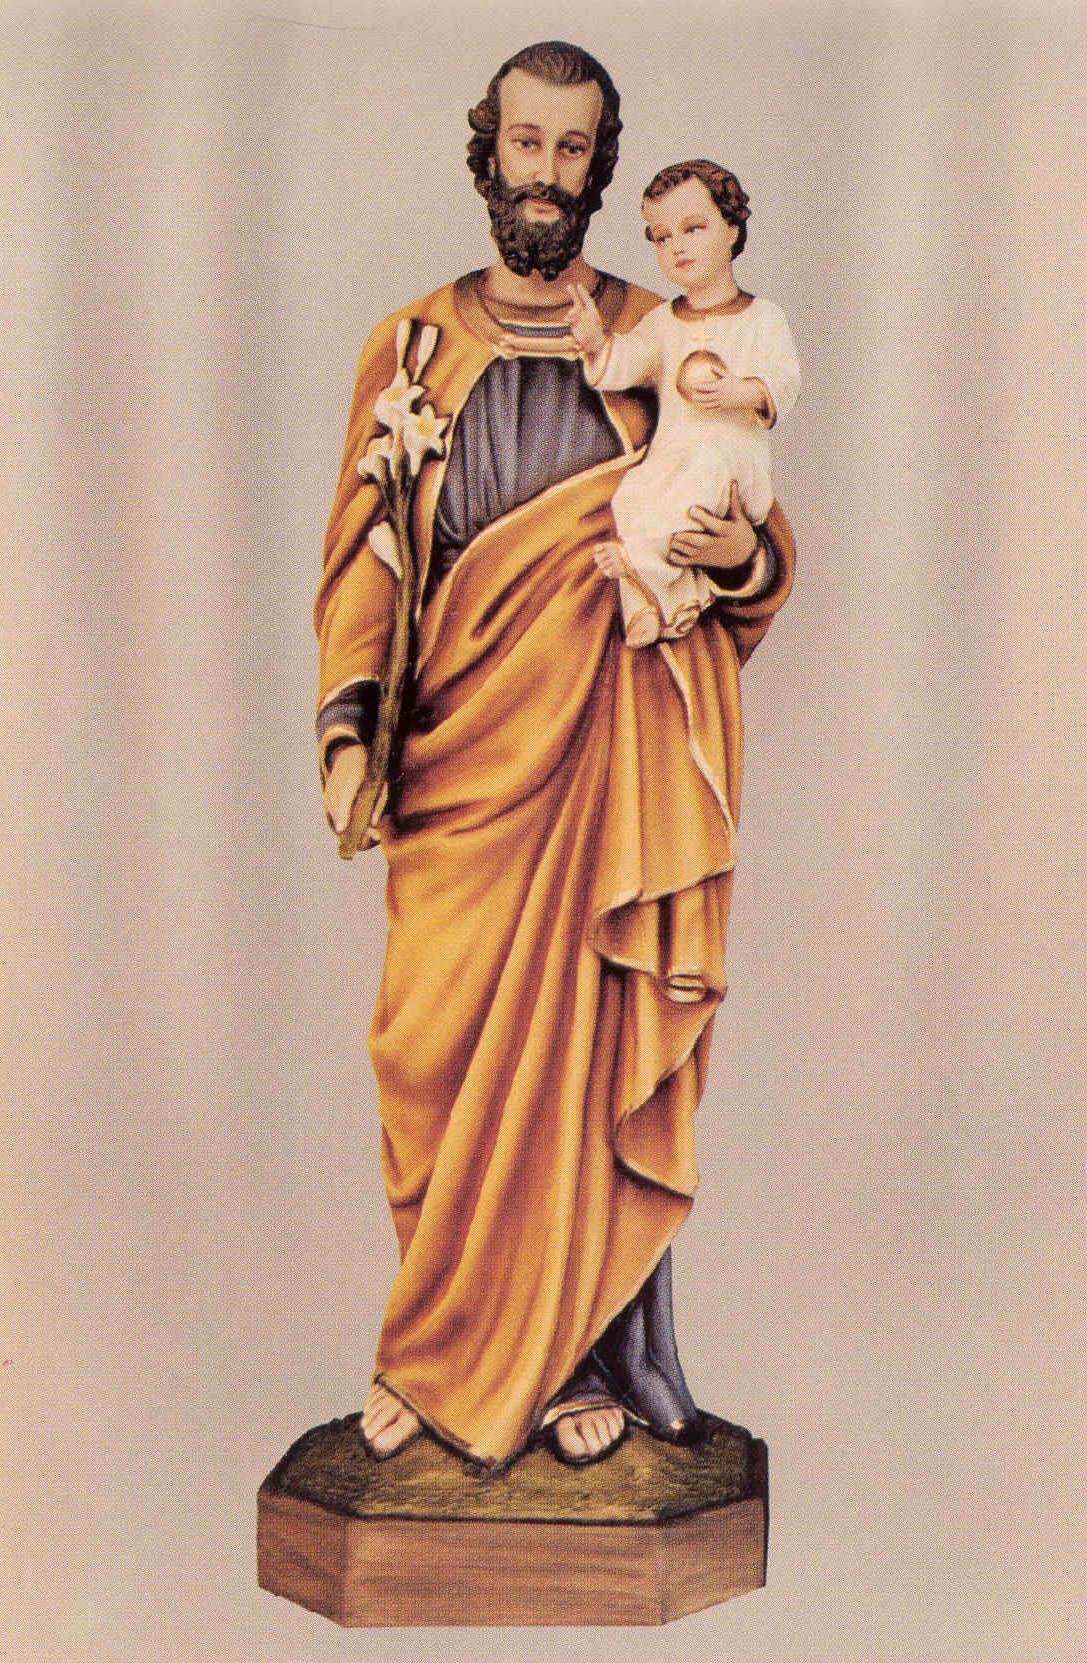 St Joseph Statue Statue St Joseph The Carpenter Vintage